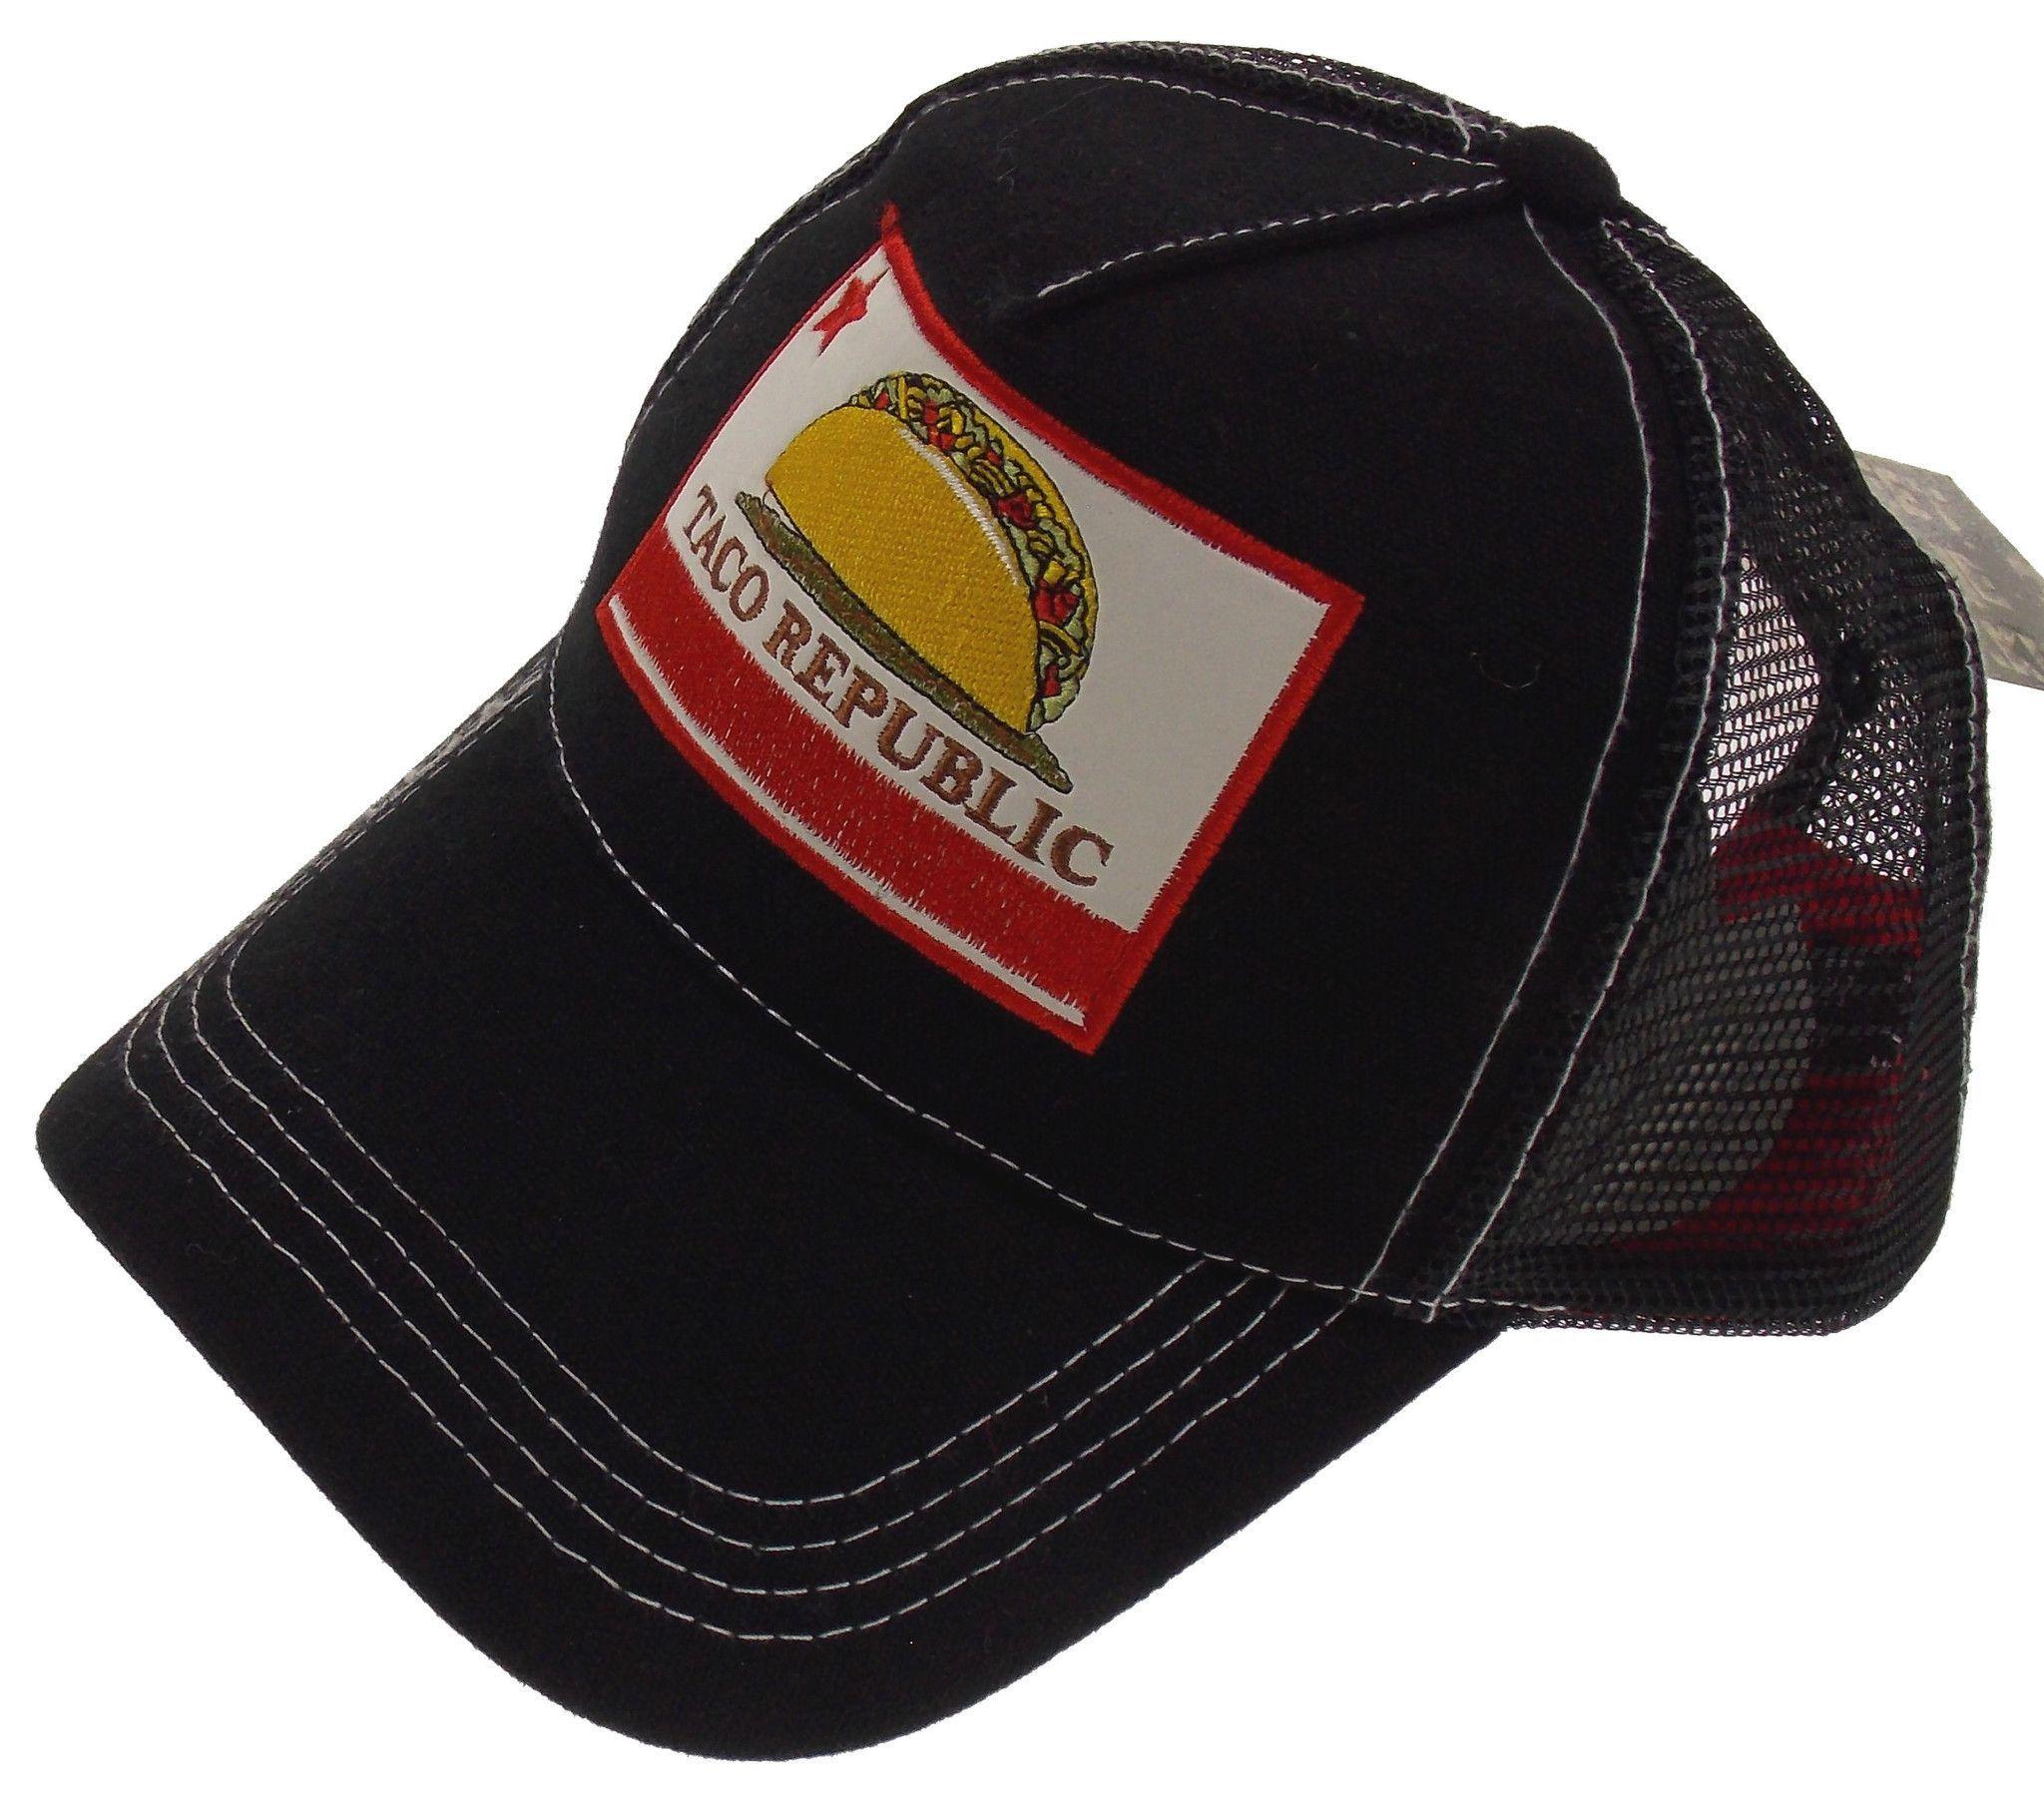 1dc715bdfde Taco Republic Makerwear Black Hat Baseball Cap OSFM Adjustable Christianus